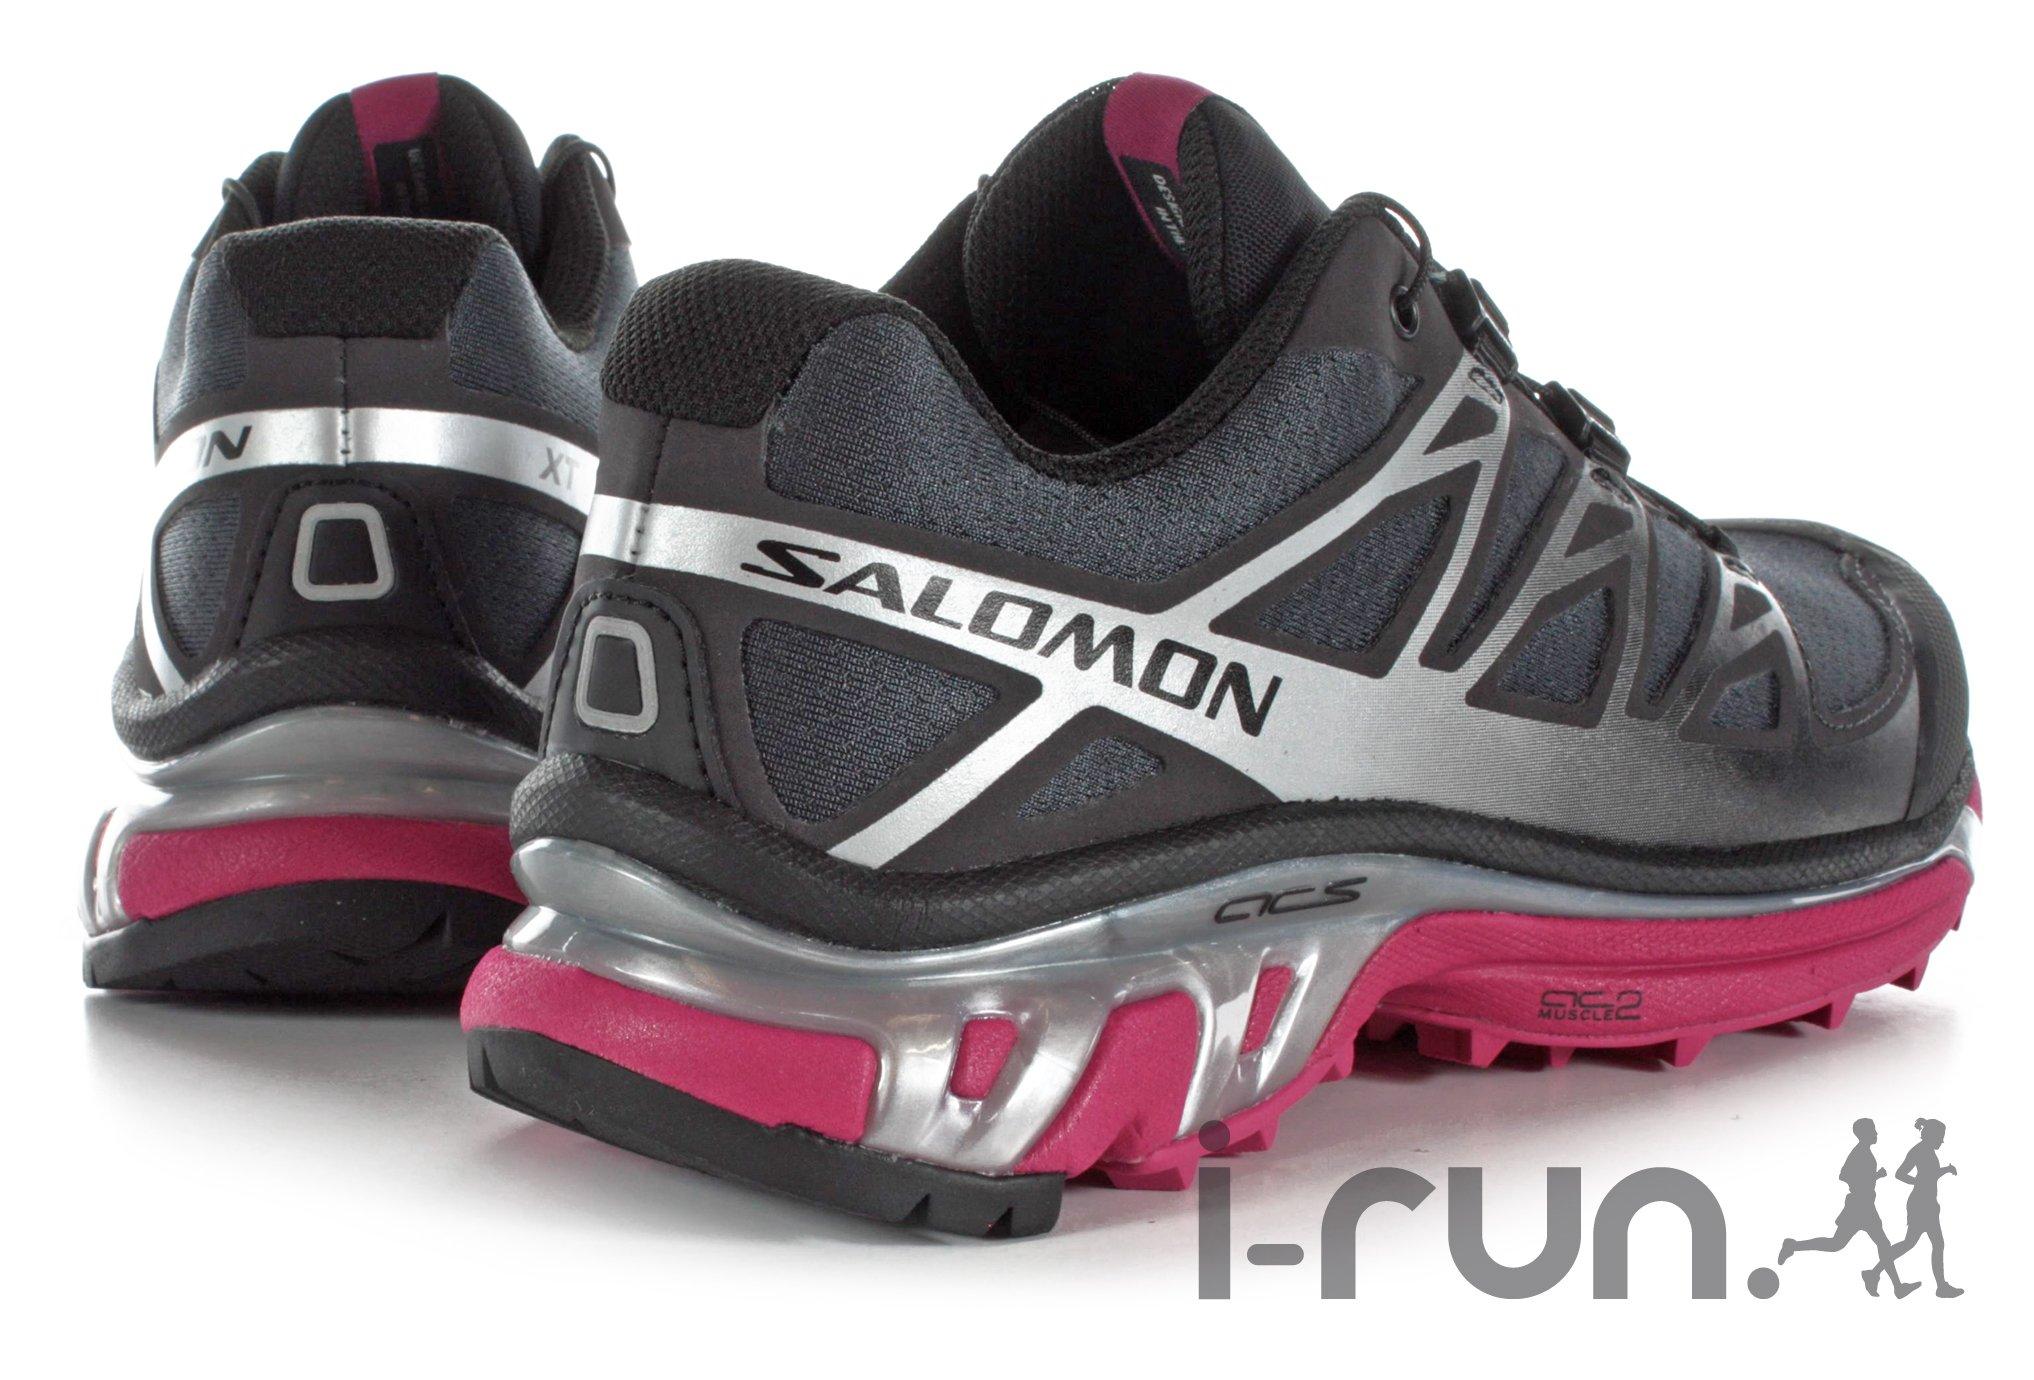 code promo bd2da d0807 chaussure trail femme salomon xt wings,soldes chaussures ...